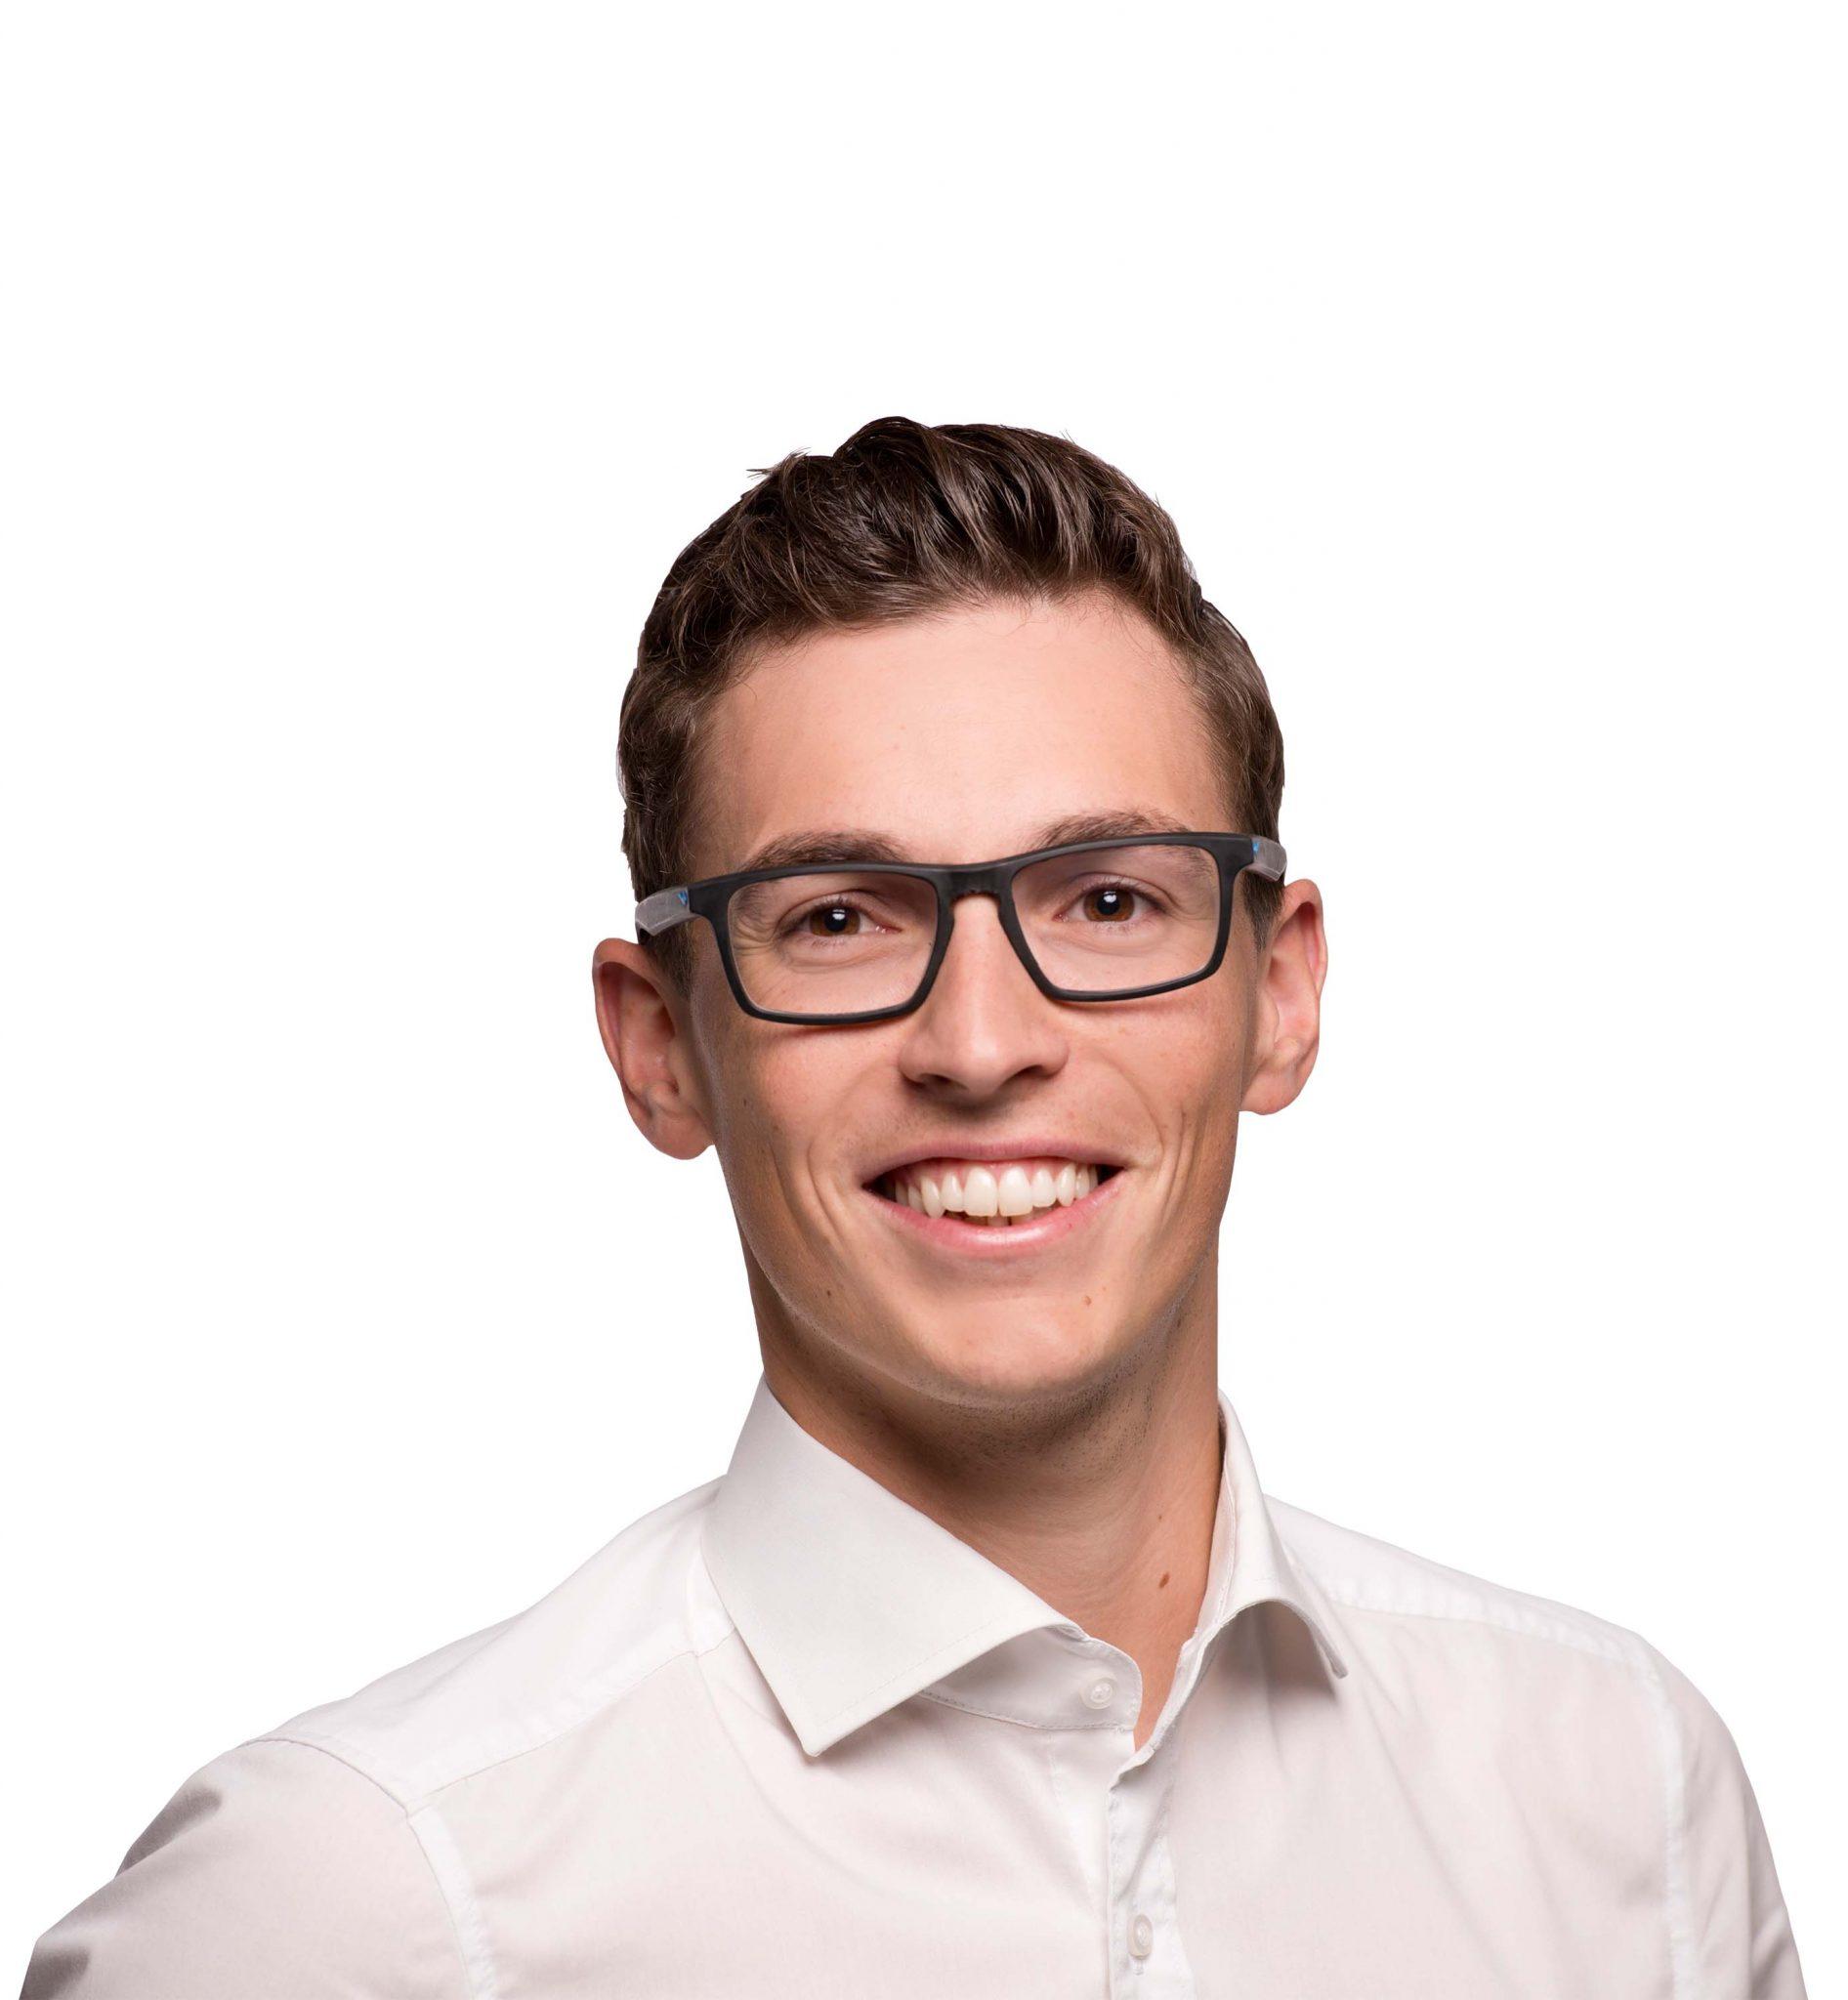 Markus Moser von Smart Learning